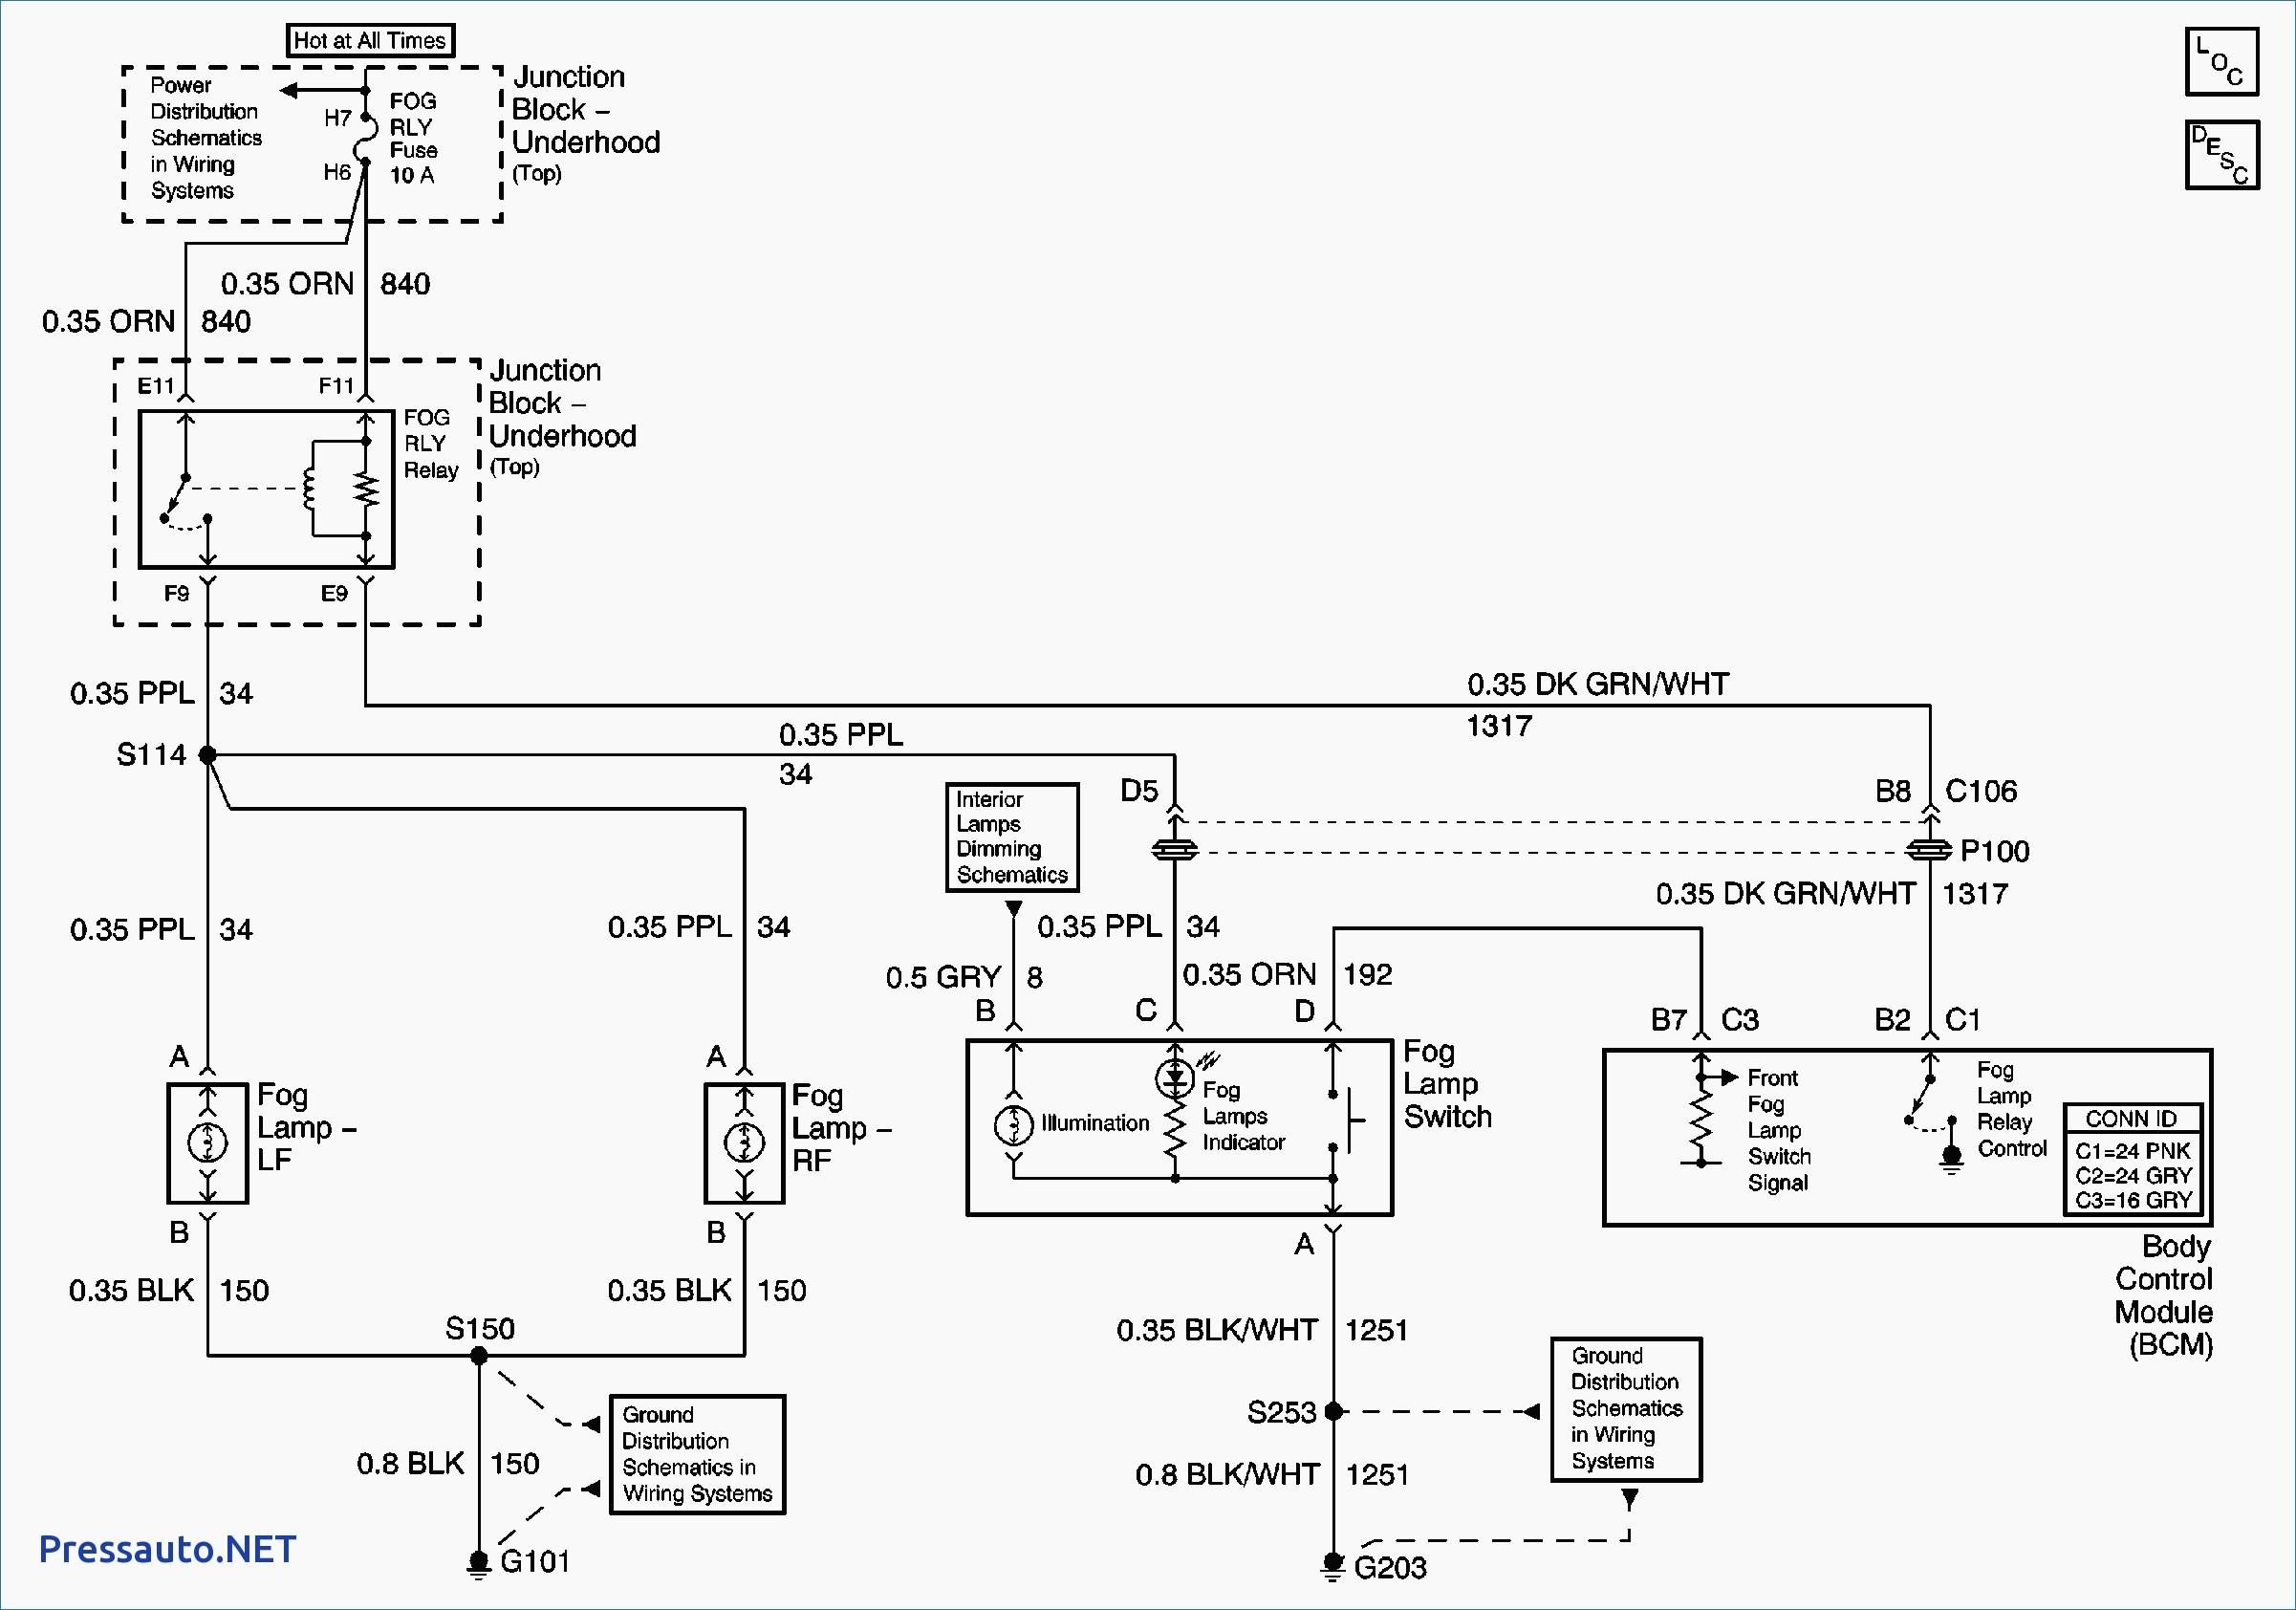 Kc Light Kit Wiring Diagram Detailed Schematics 12 Volt Fog L Schematic Daylighters Image Hilites Relay